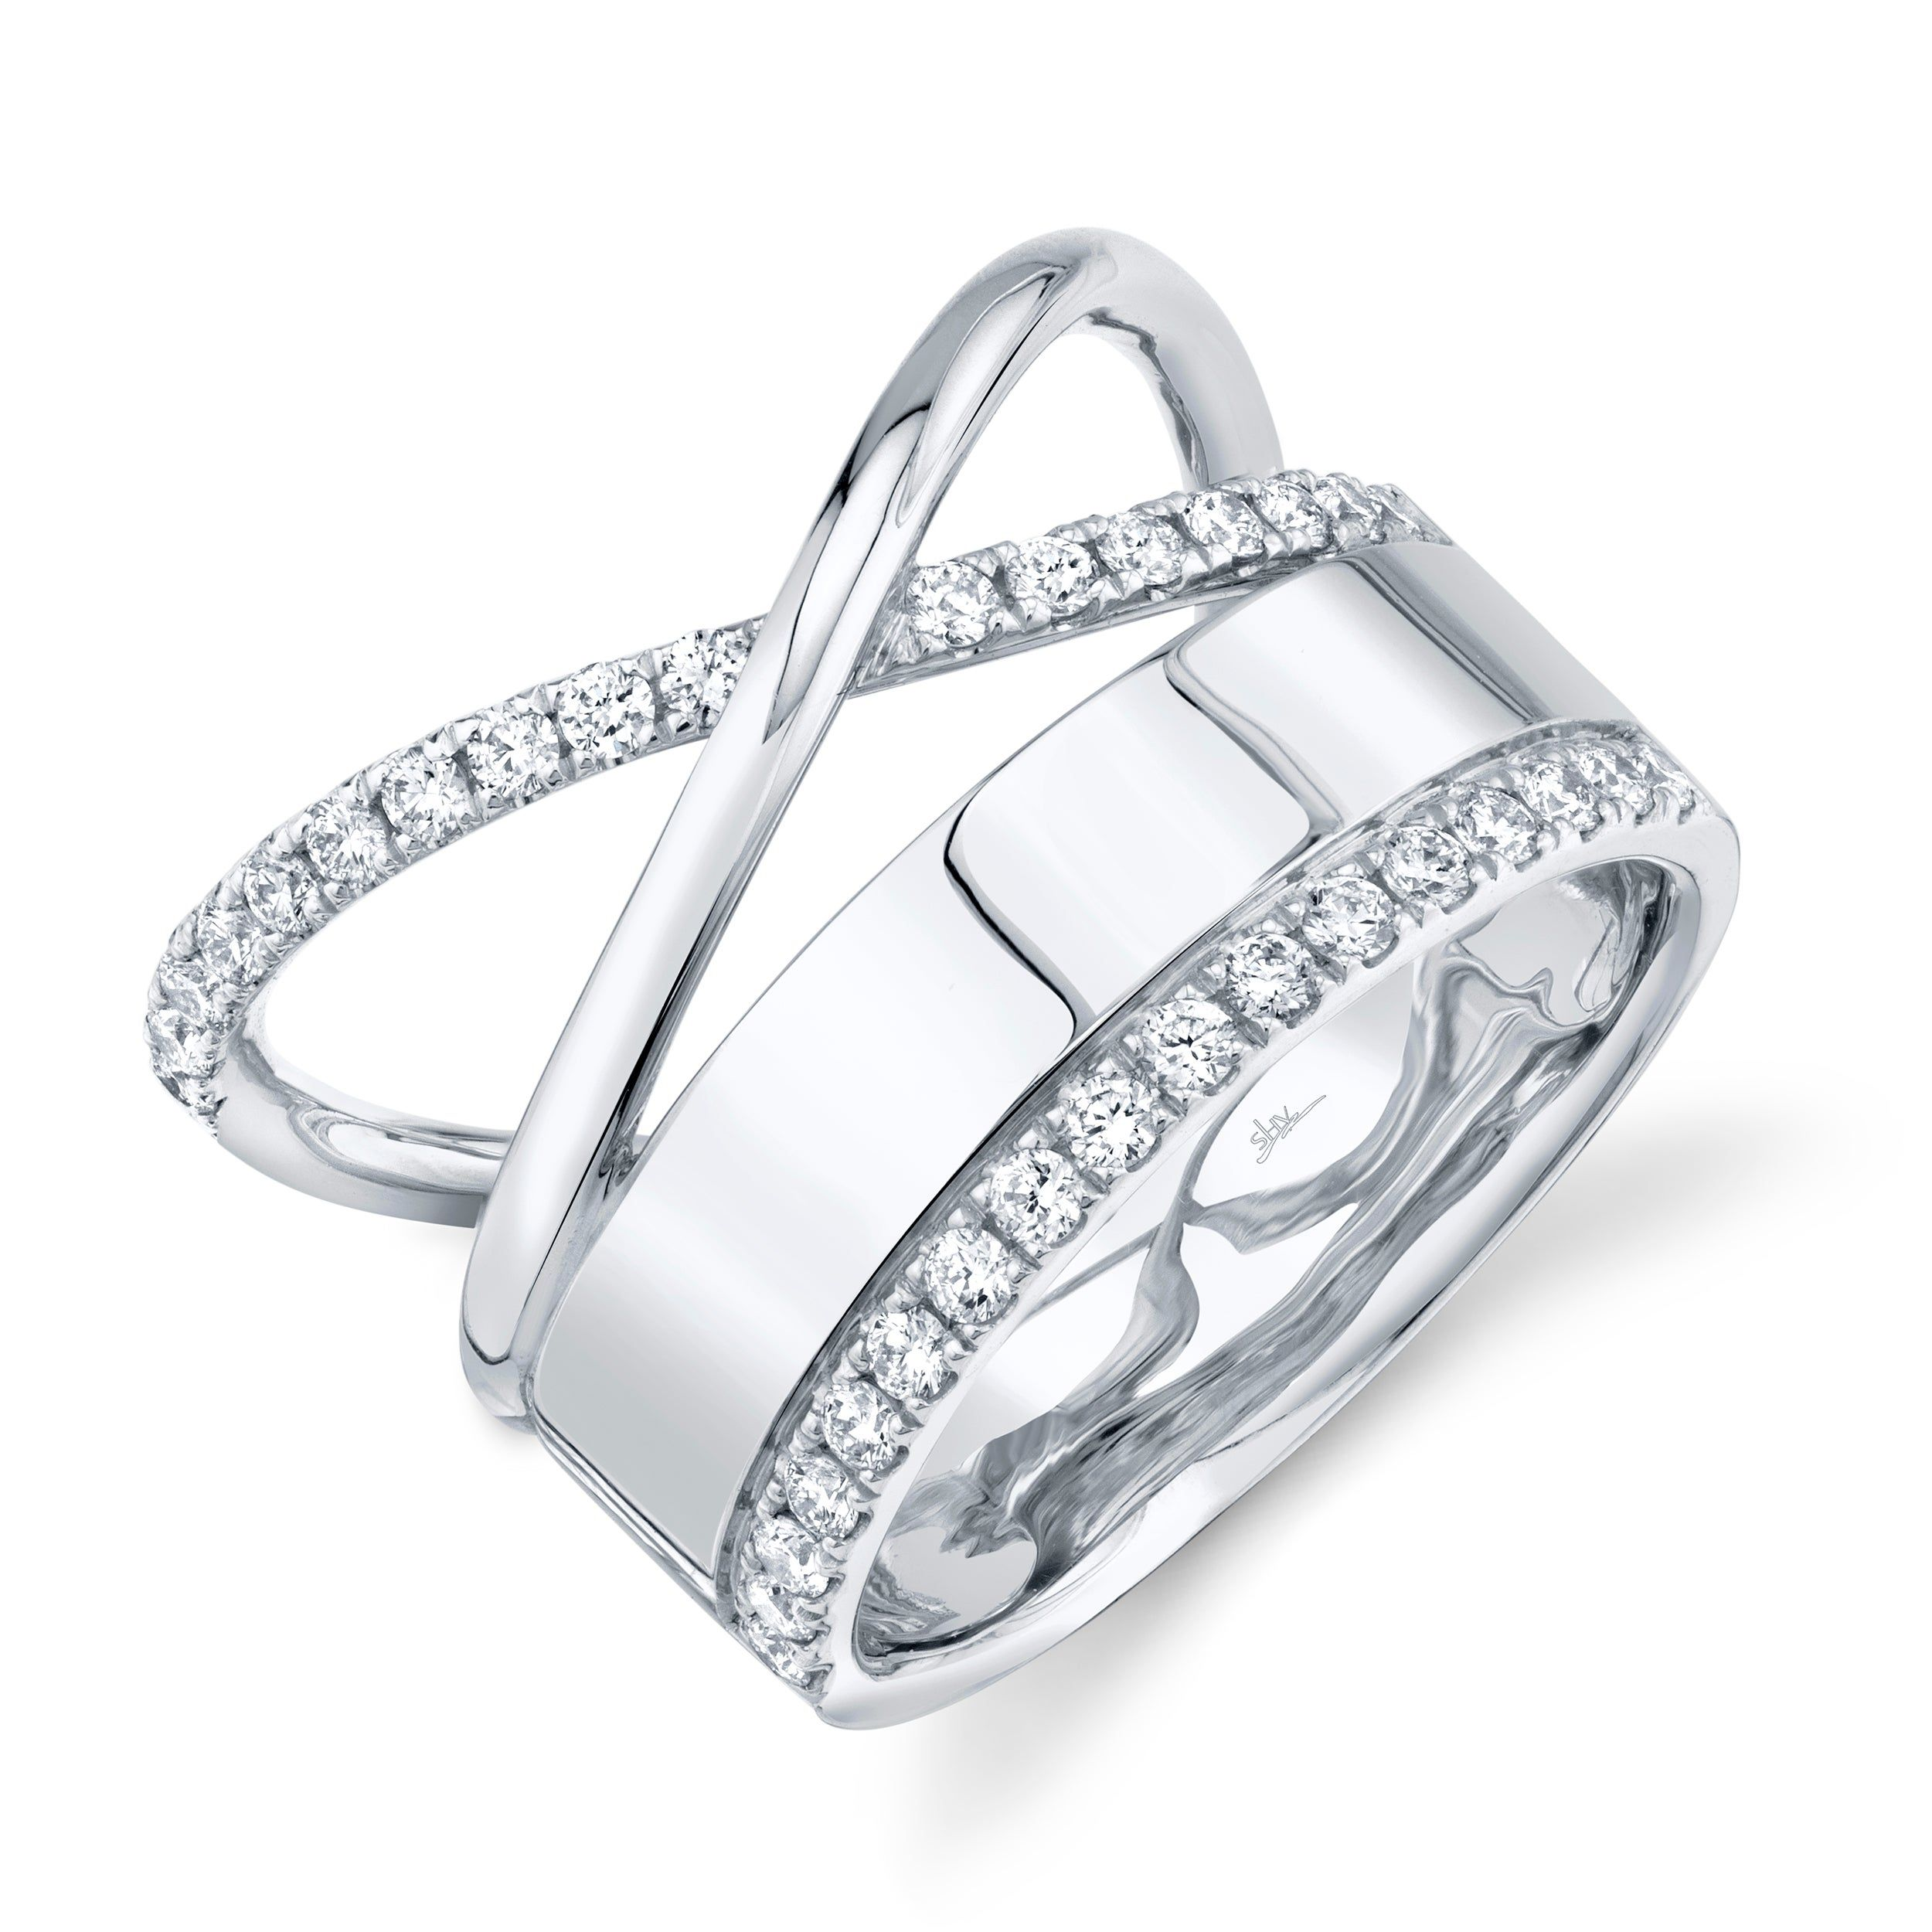 Shy Creation Diamond Crisscross Band In 14k White Gold Sc55008568 In 2020 Fashion Rings White Gold Rings White Gold